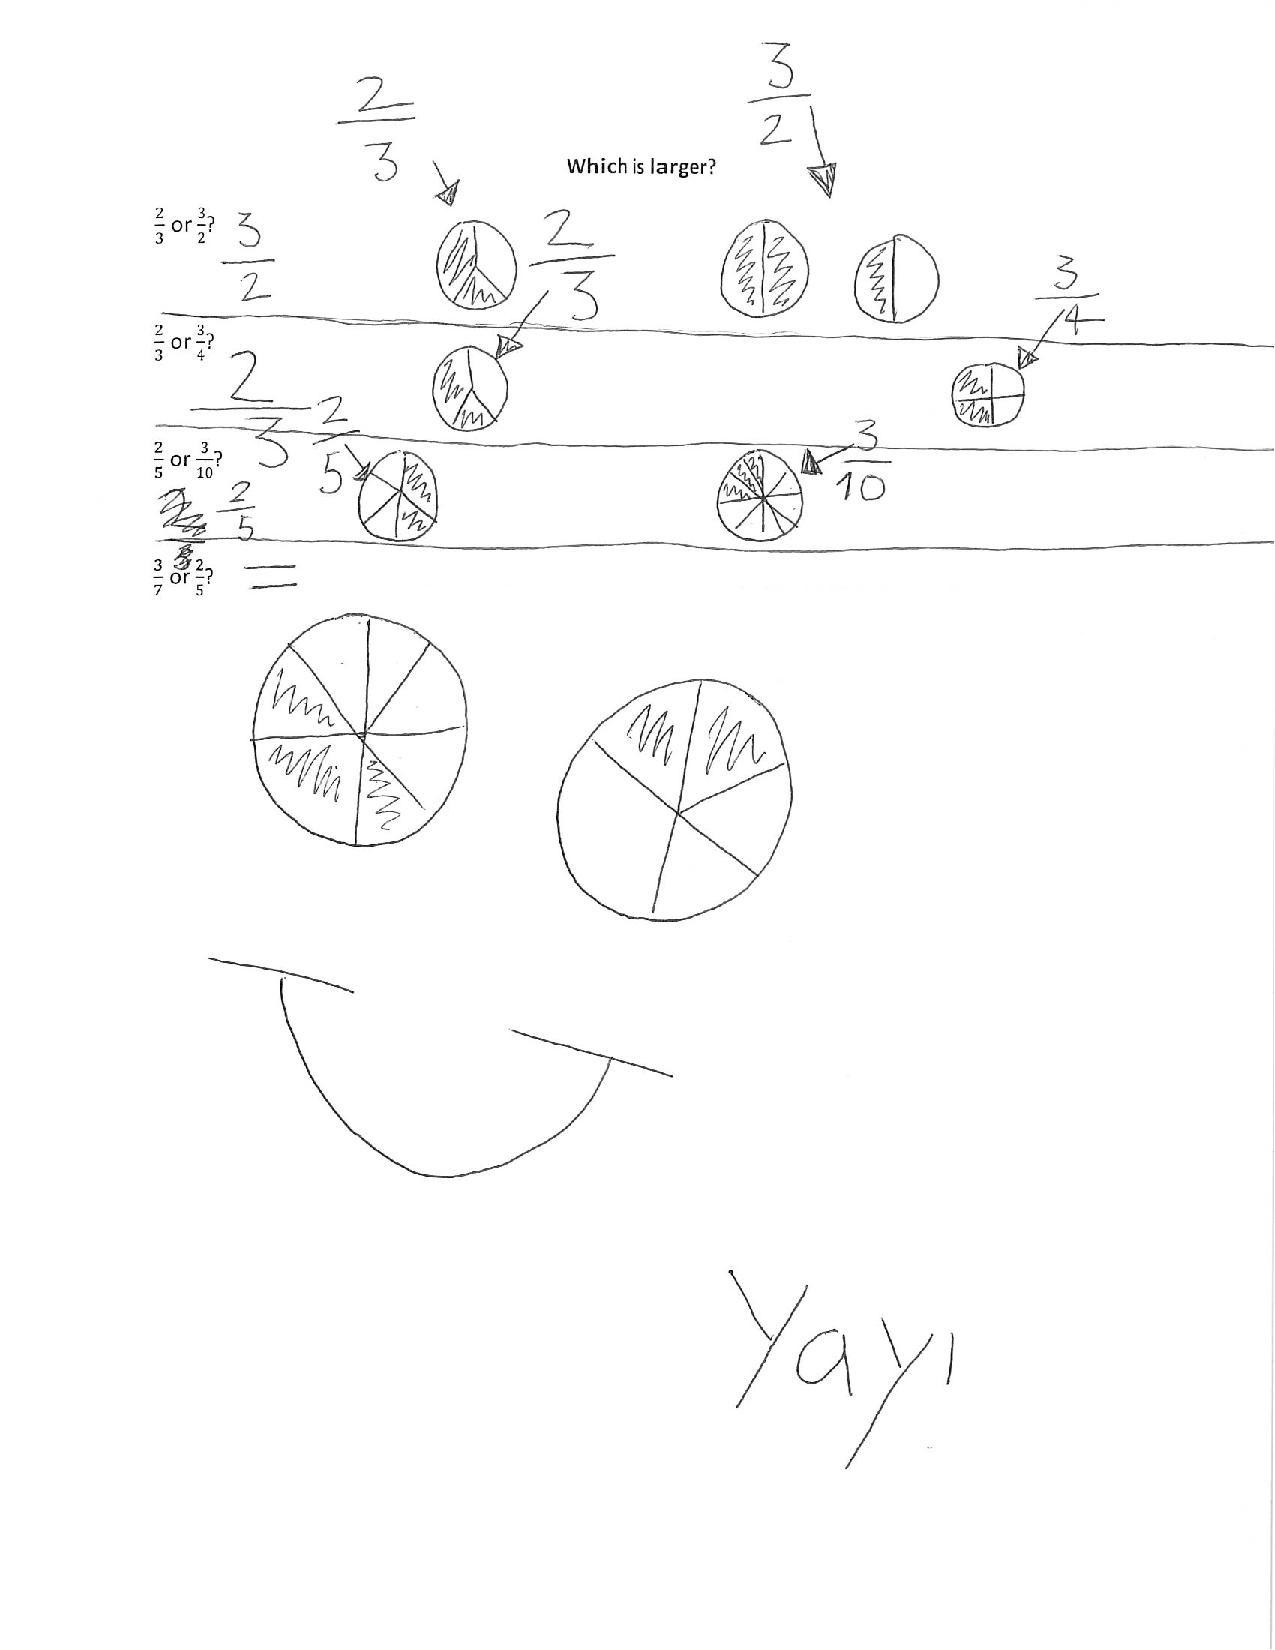 Elementary School Math Mistakes